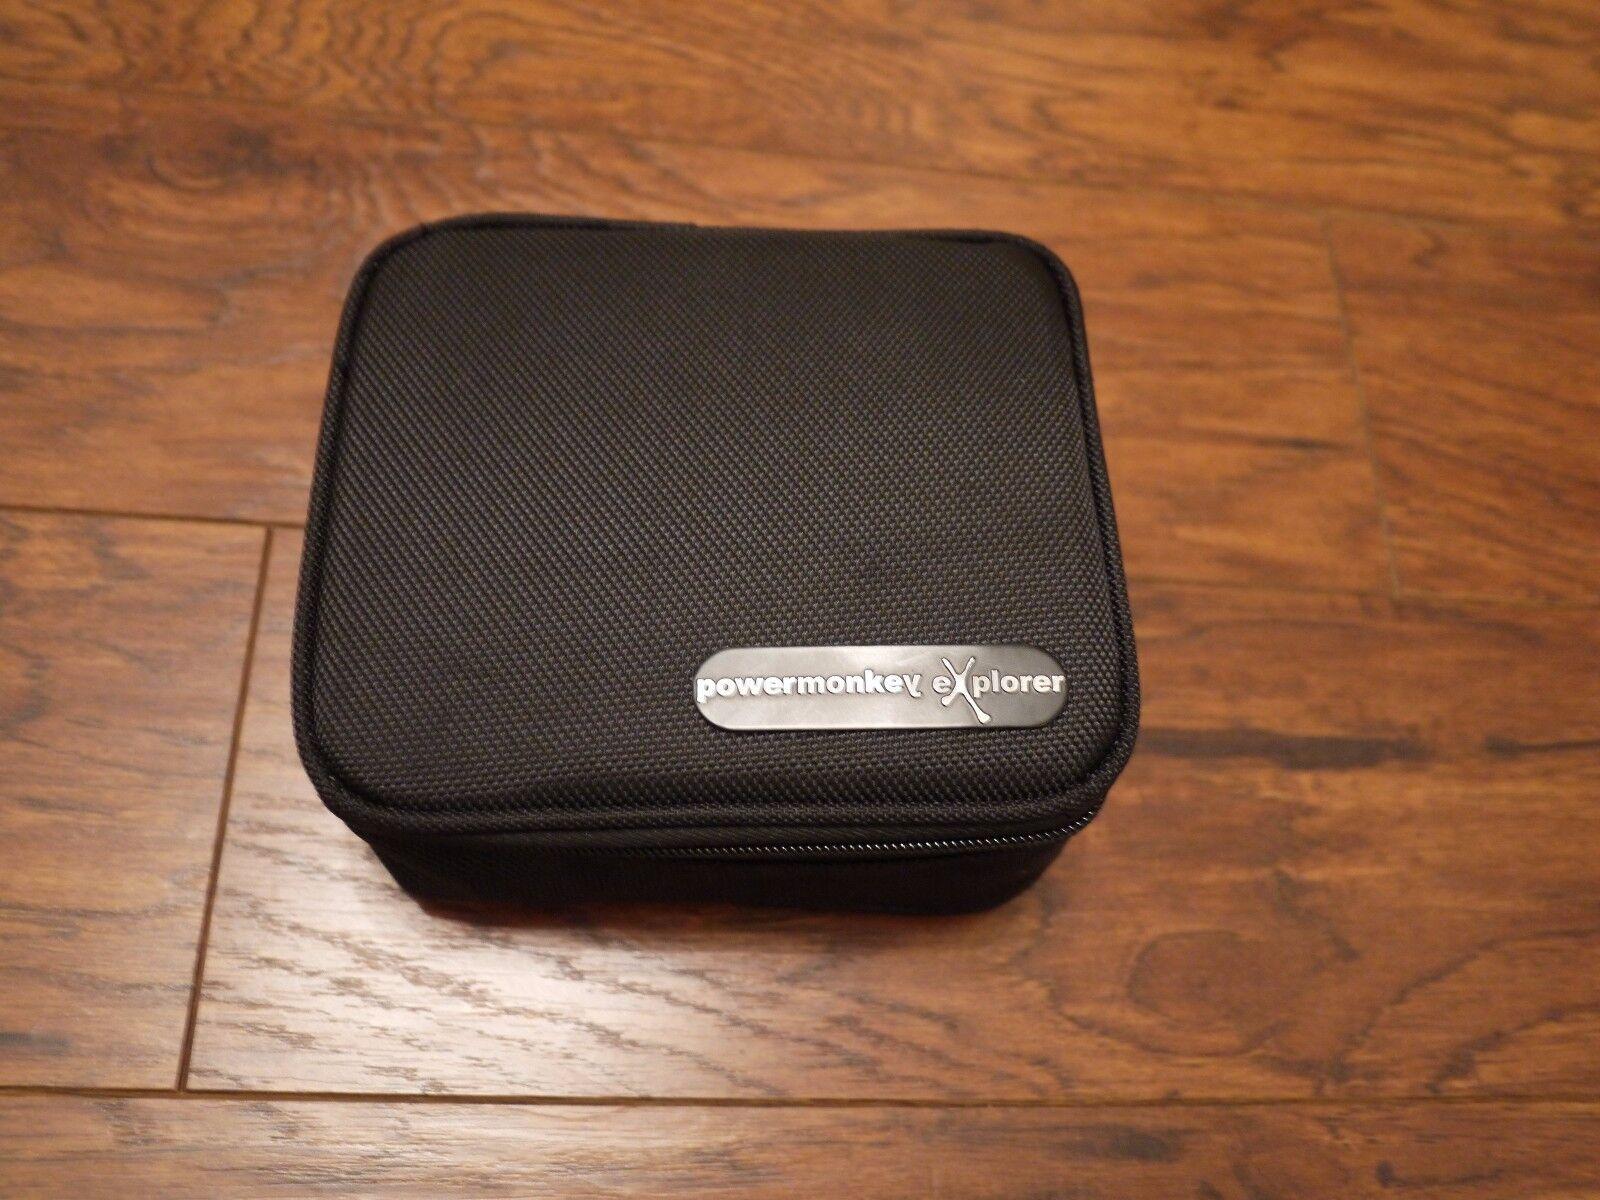 Powertraveller Powermonkey Explorer  Solar Portable Charger - Yellow  authentic